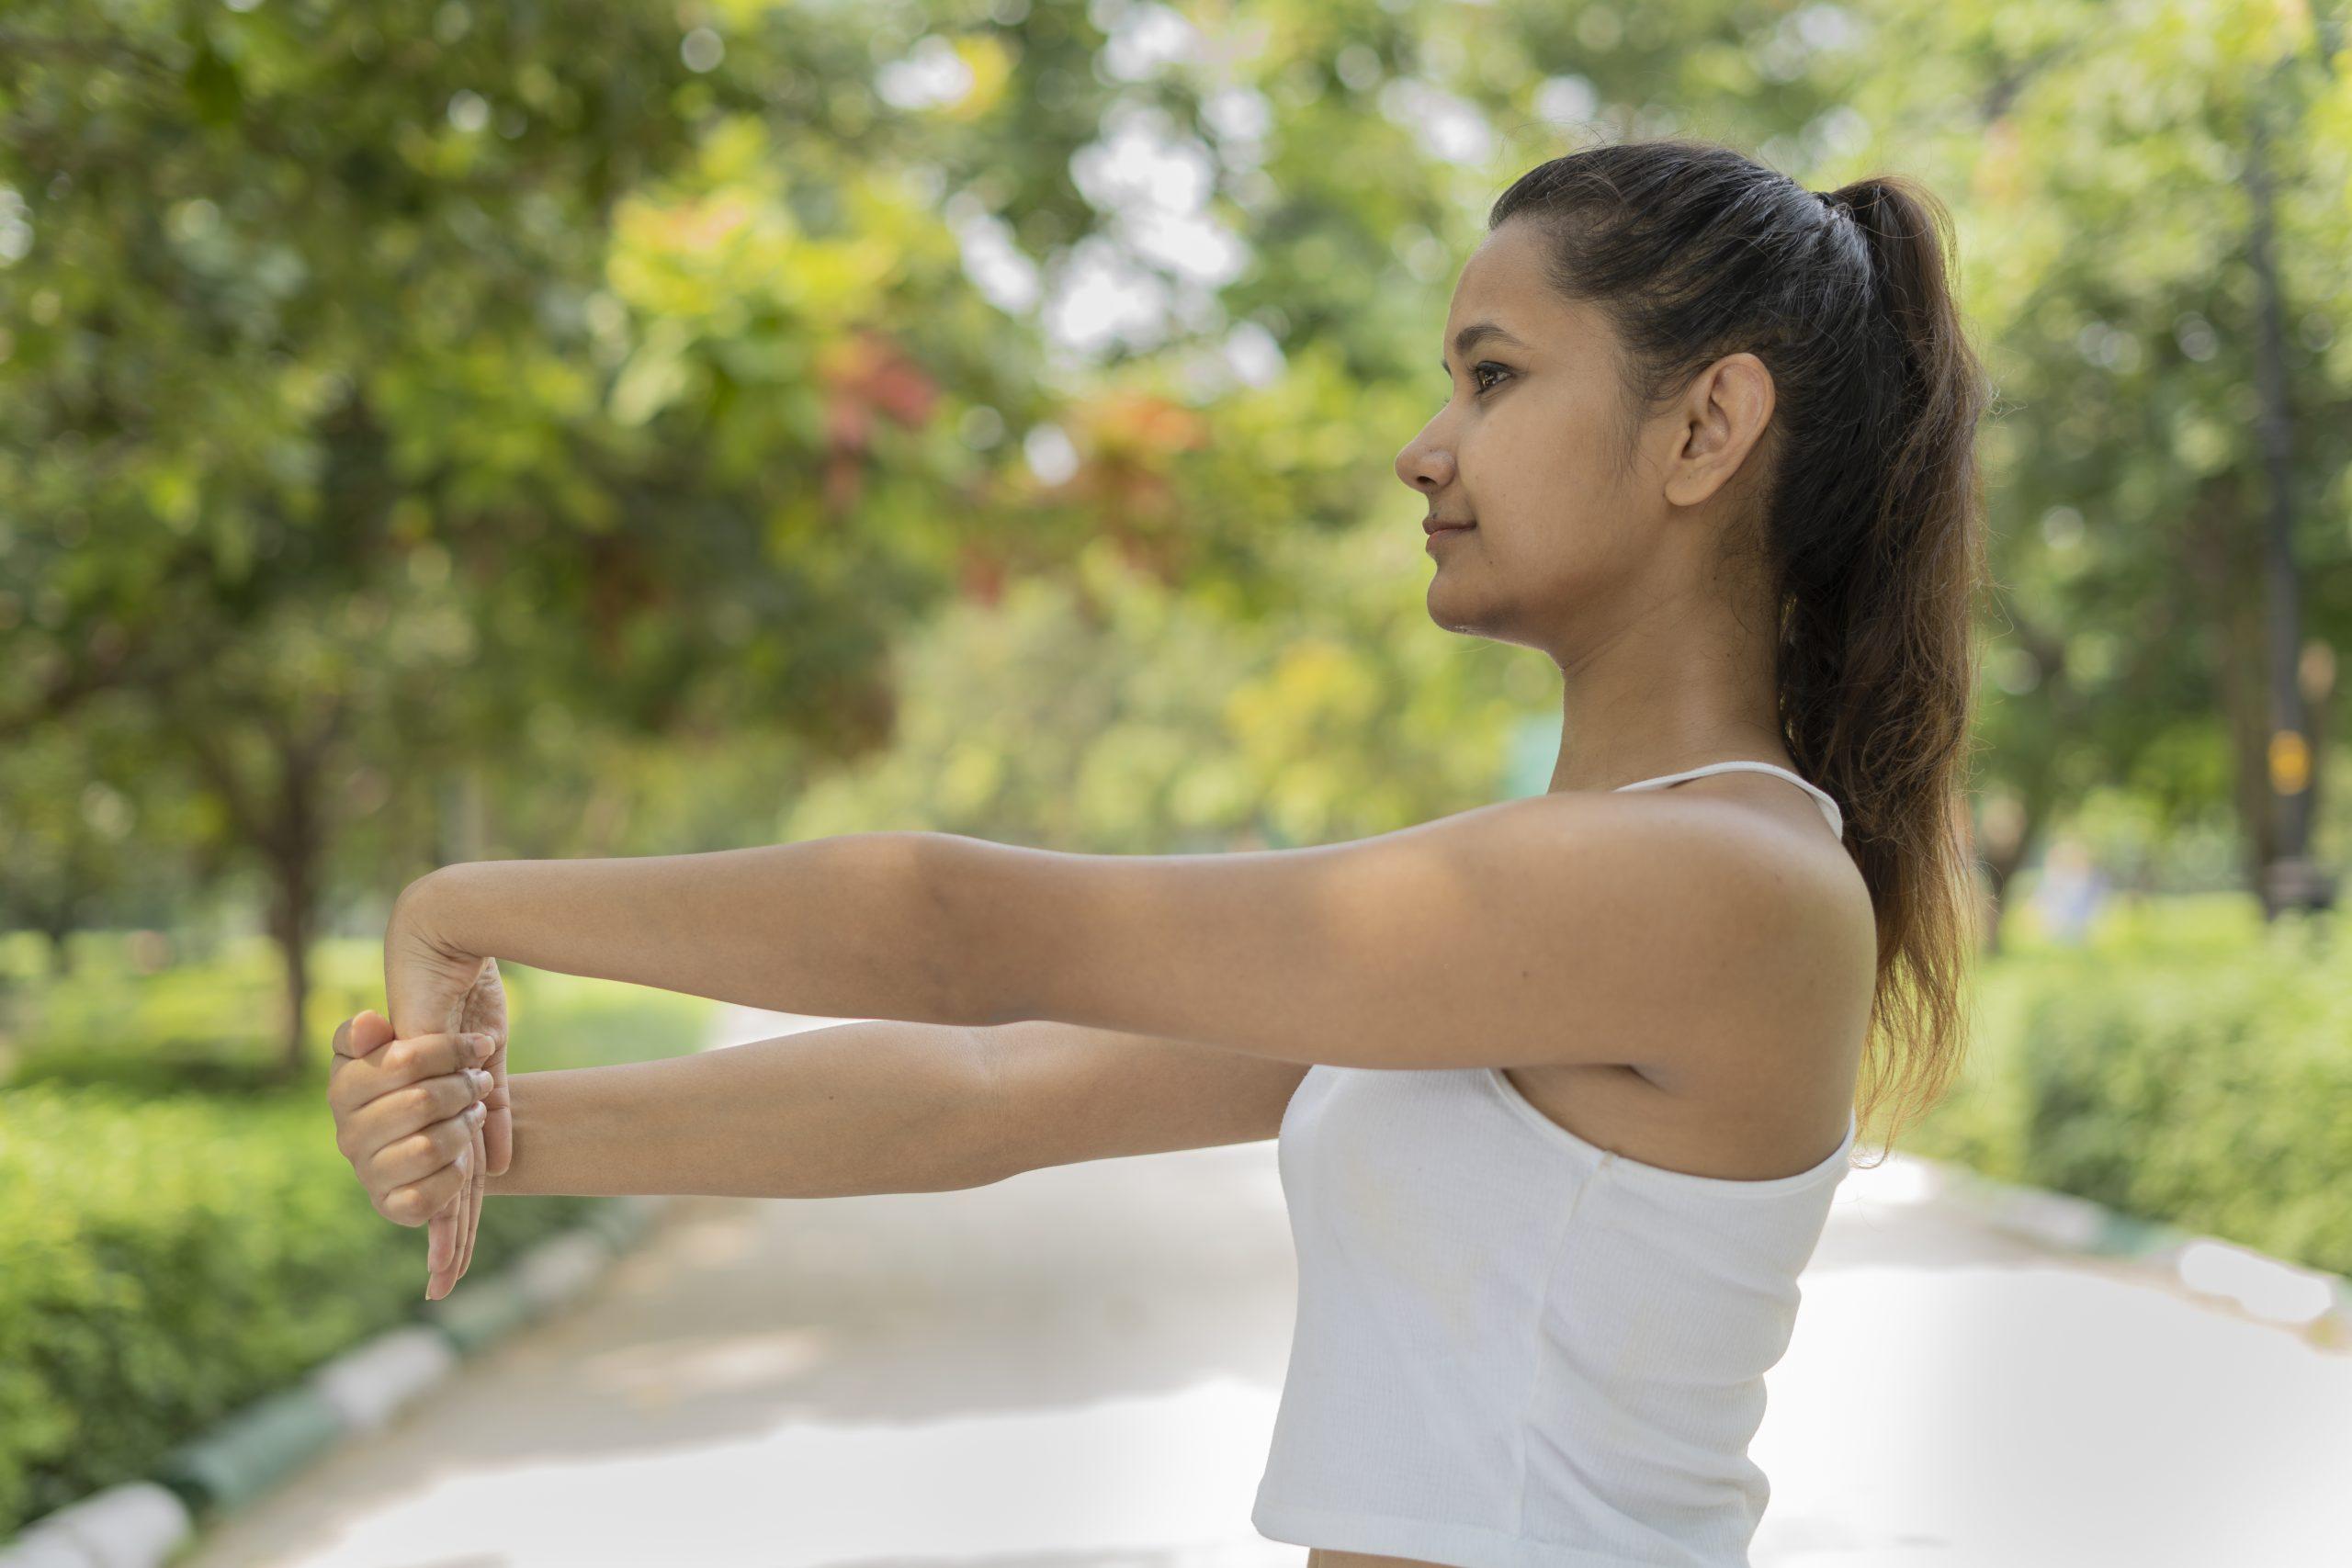 girl stretching wrist